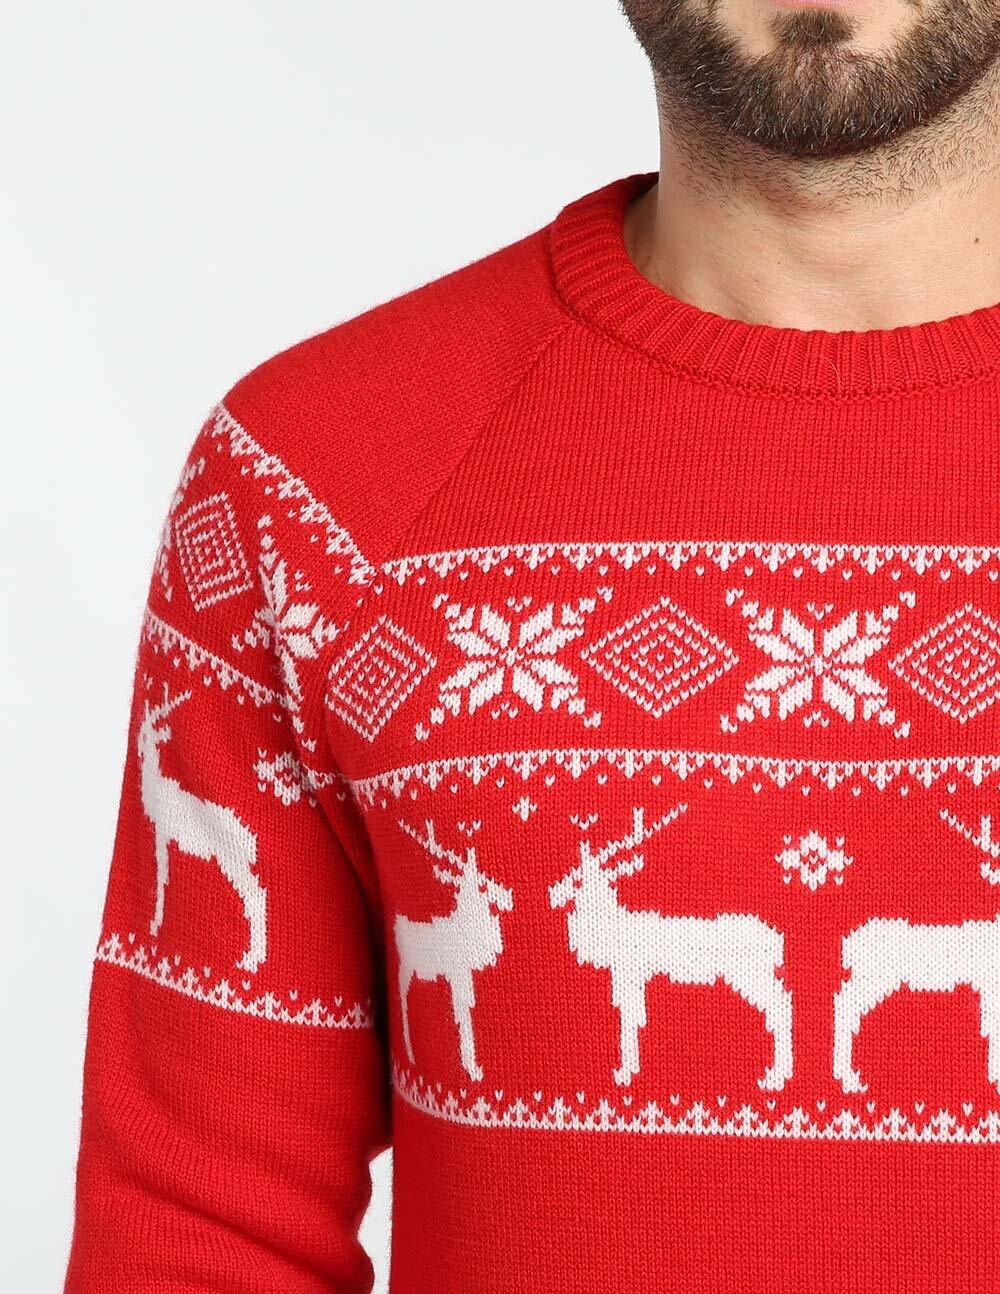 картинки на свитер с оленемер сюжету ленты женя